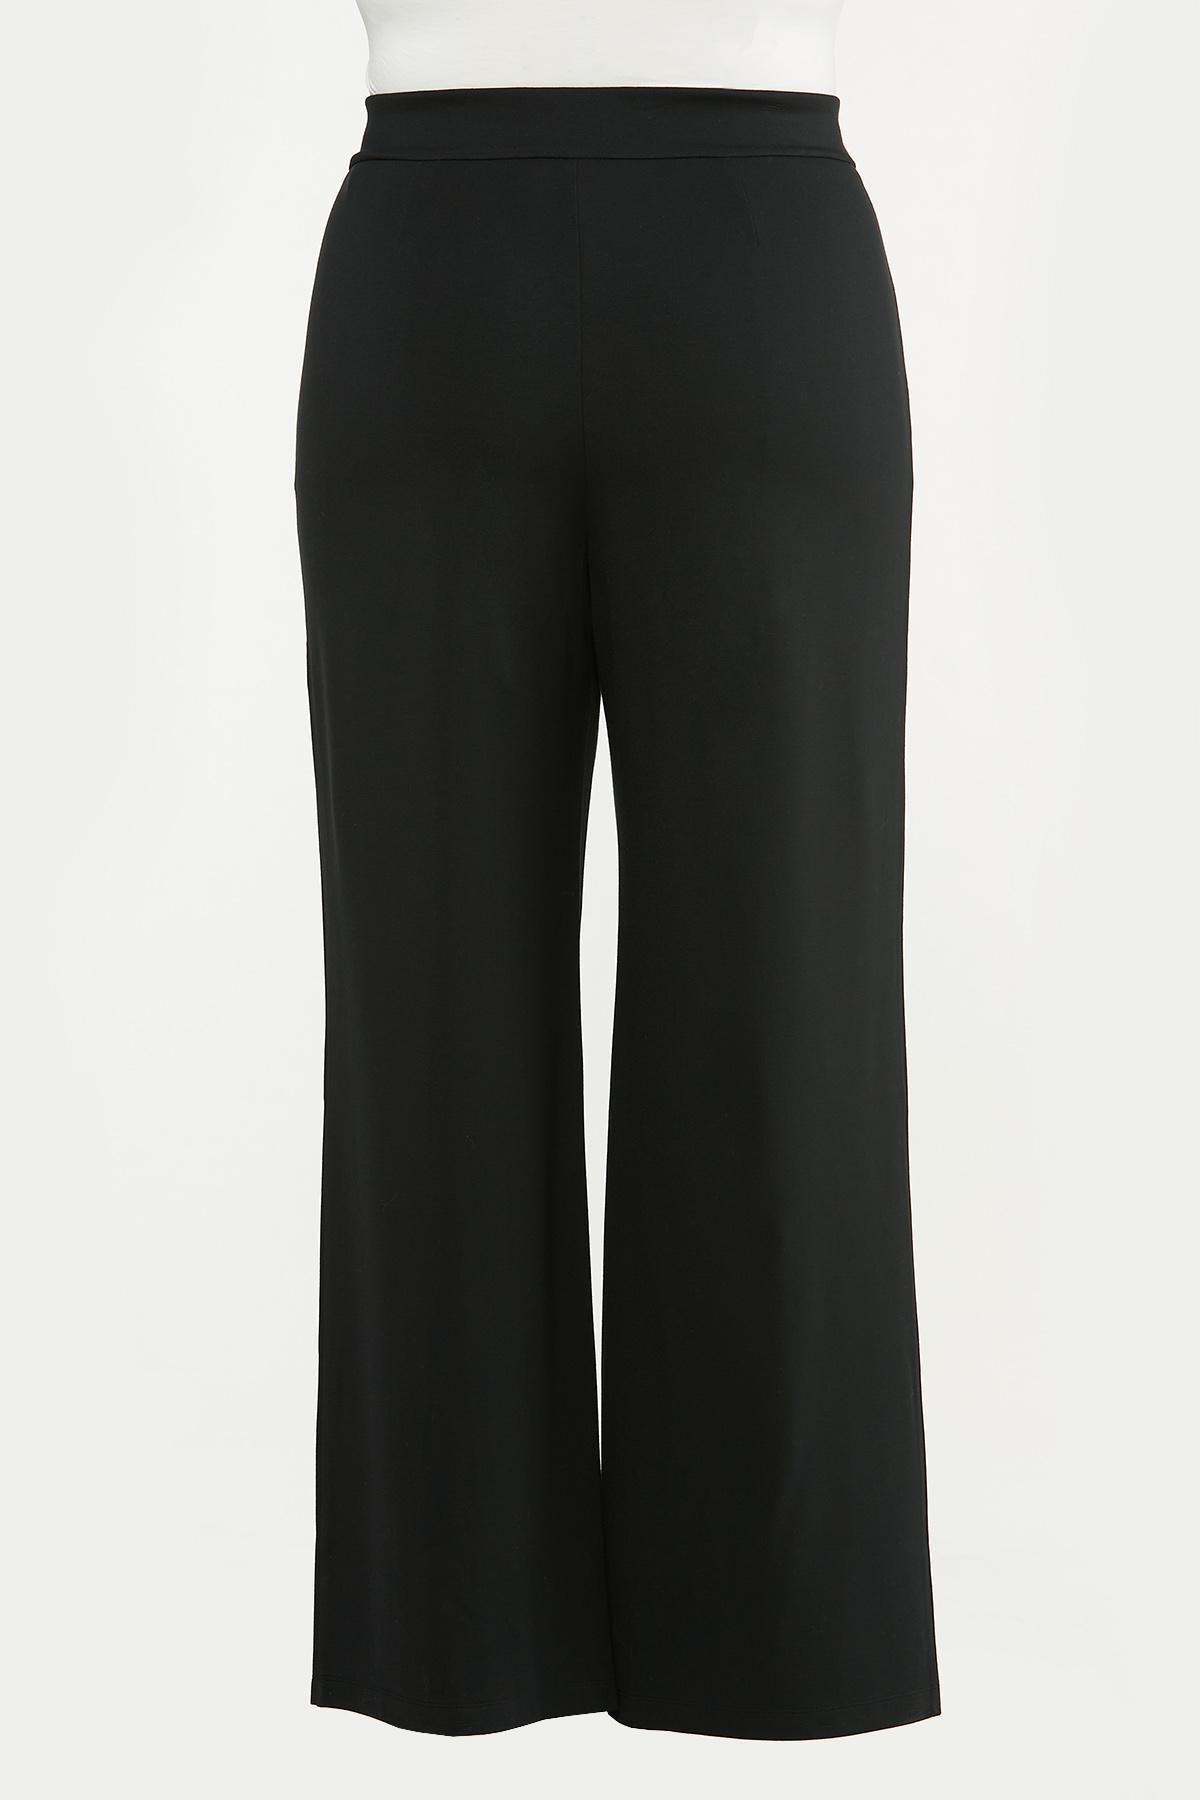 Plus Size Tie Waist Ponte Pants (Item #44684873)